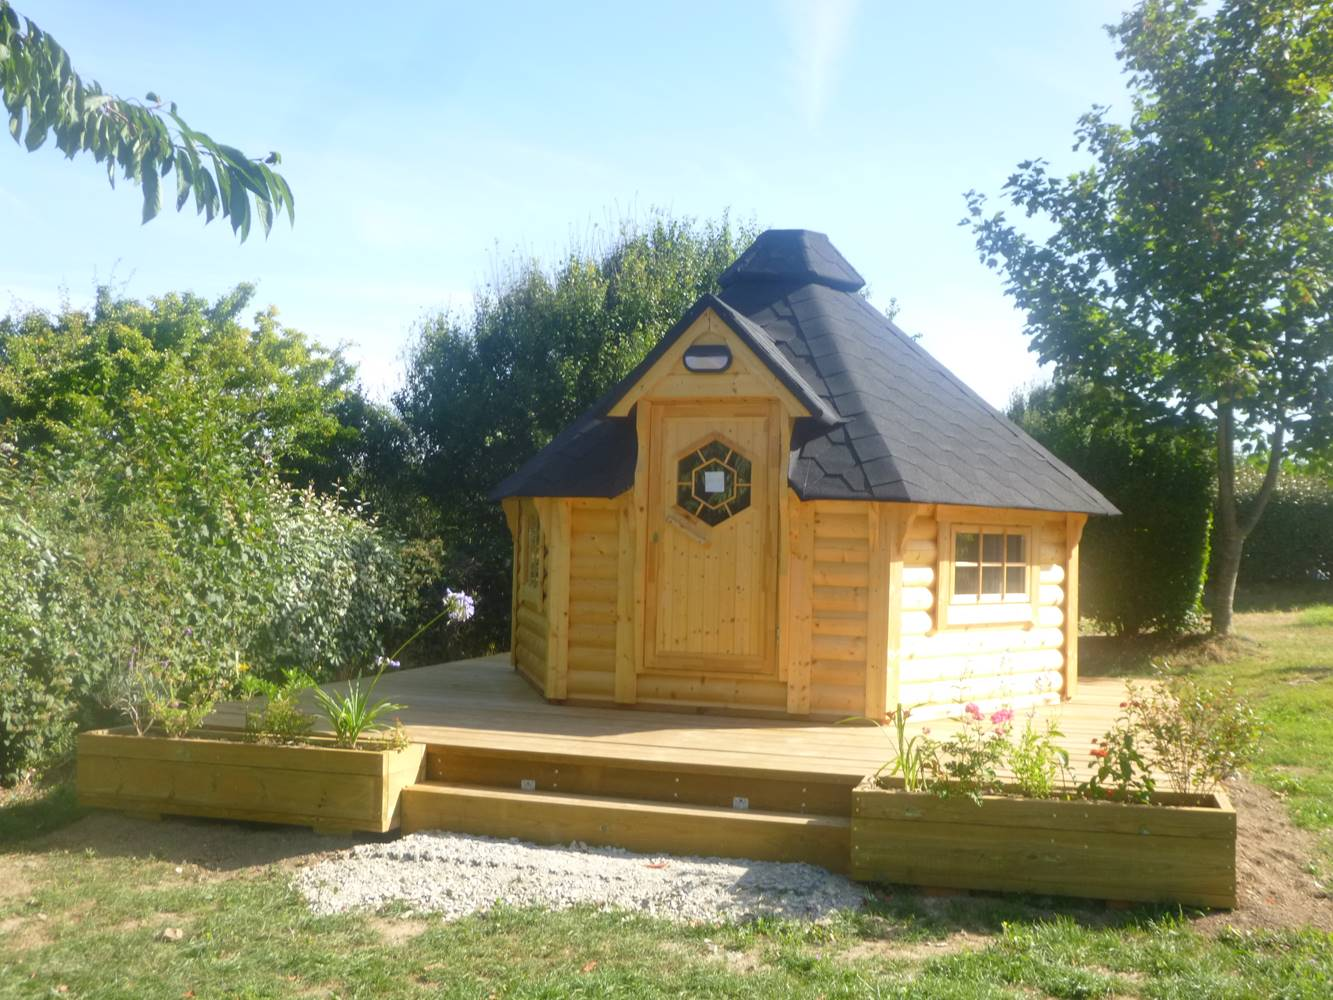 Location Cabane camping belle ile bretagne sud ©